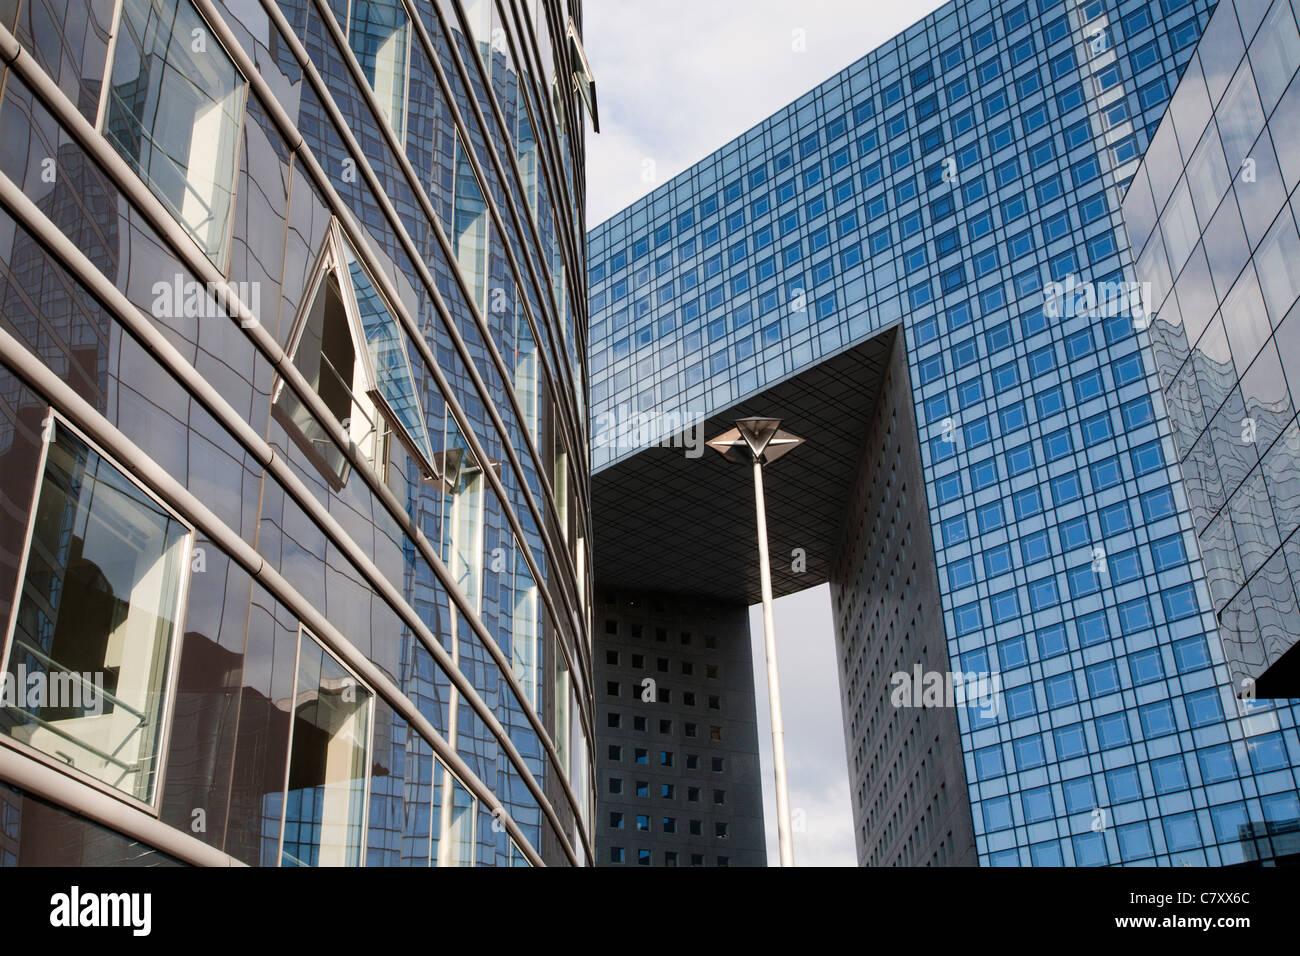 Parigi - Architettura moderna dalla difesa Immagini Stock